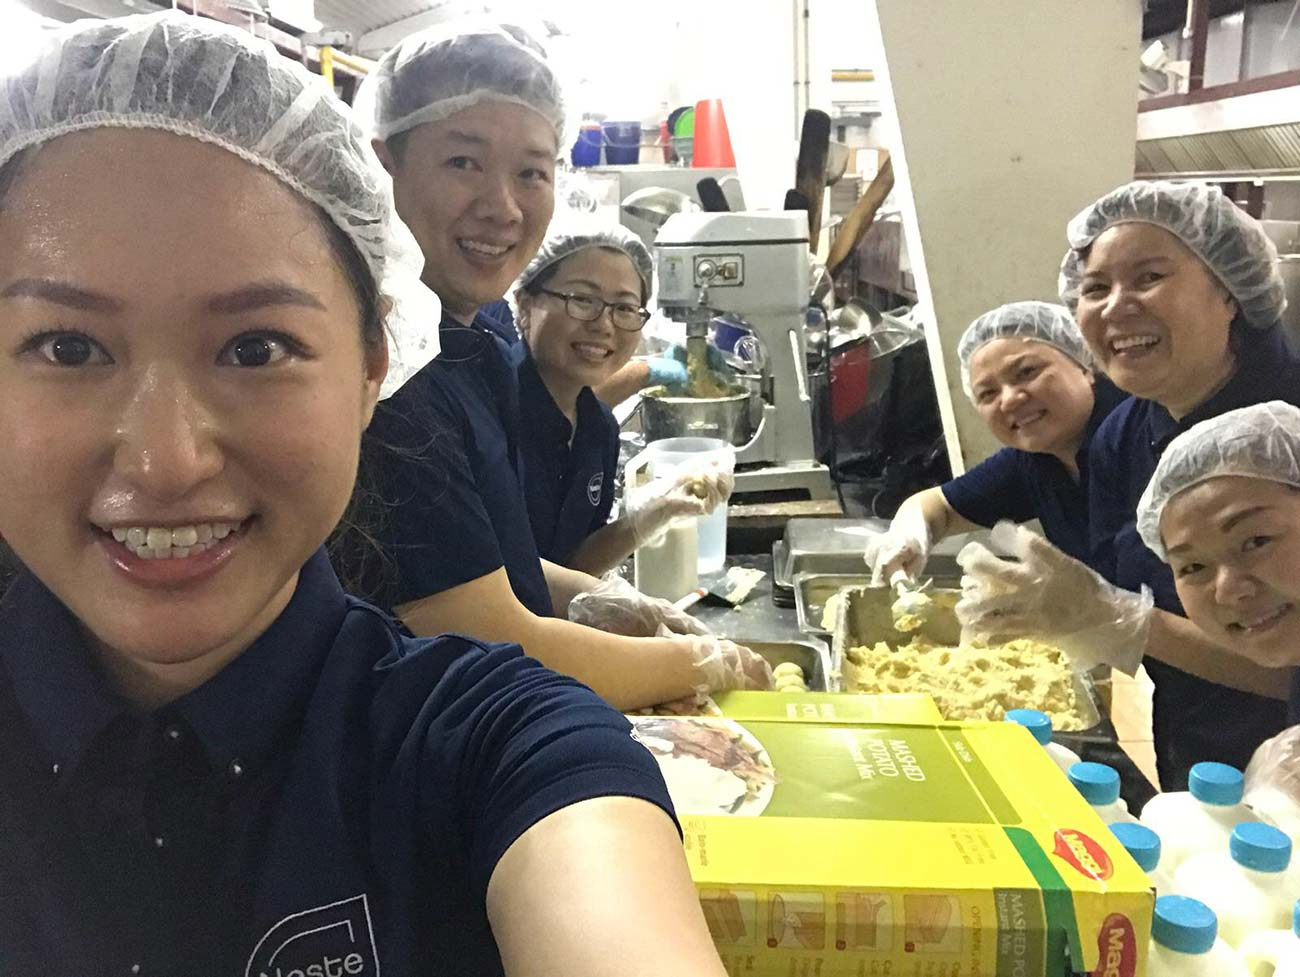 Singapore team did volunteering work preparing meals at Willing Hearts.